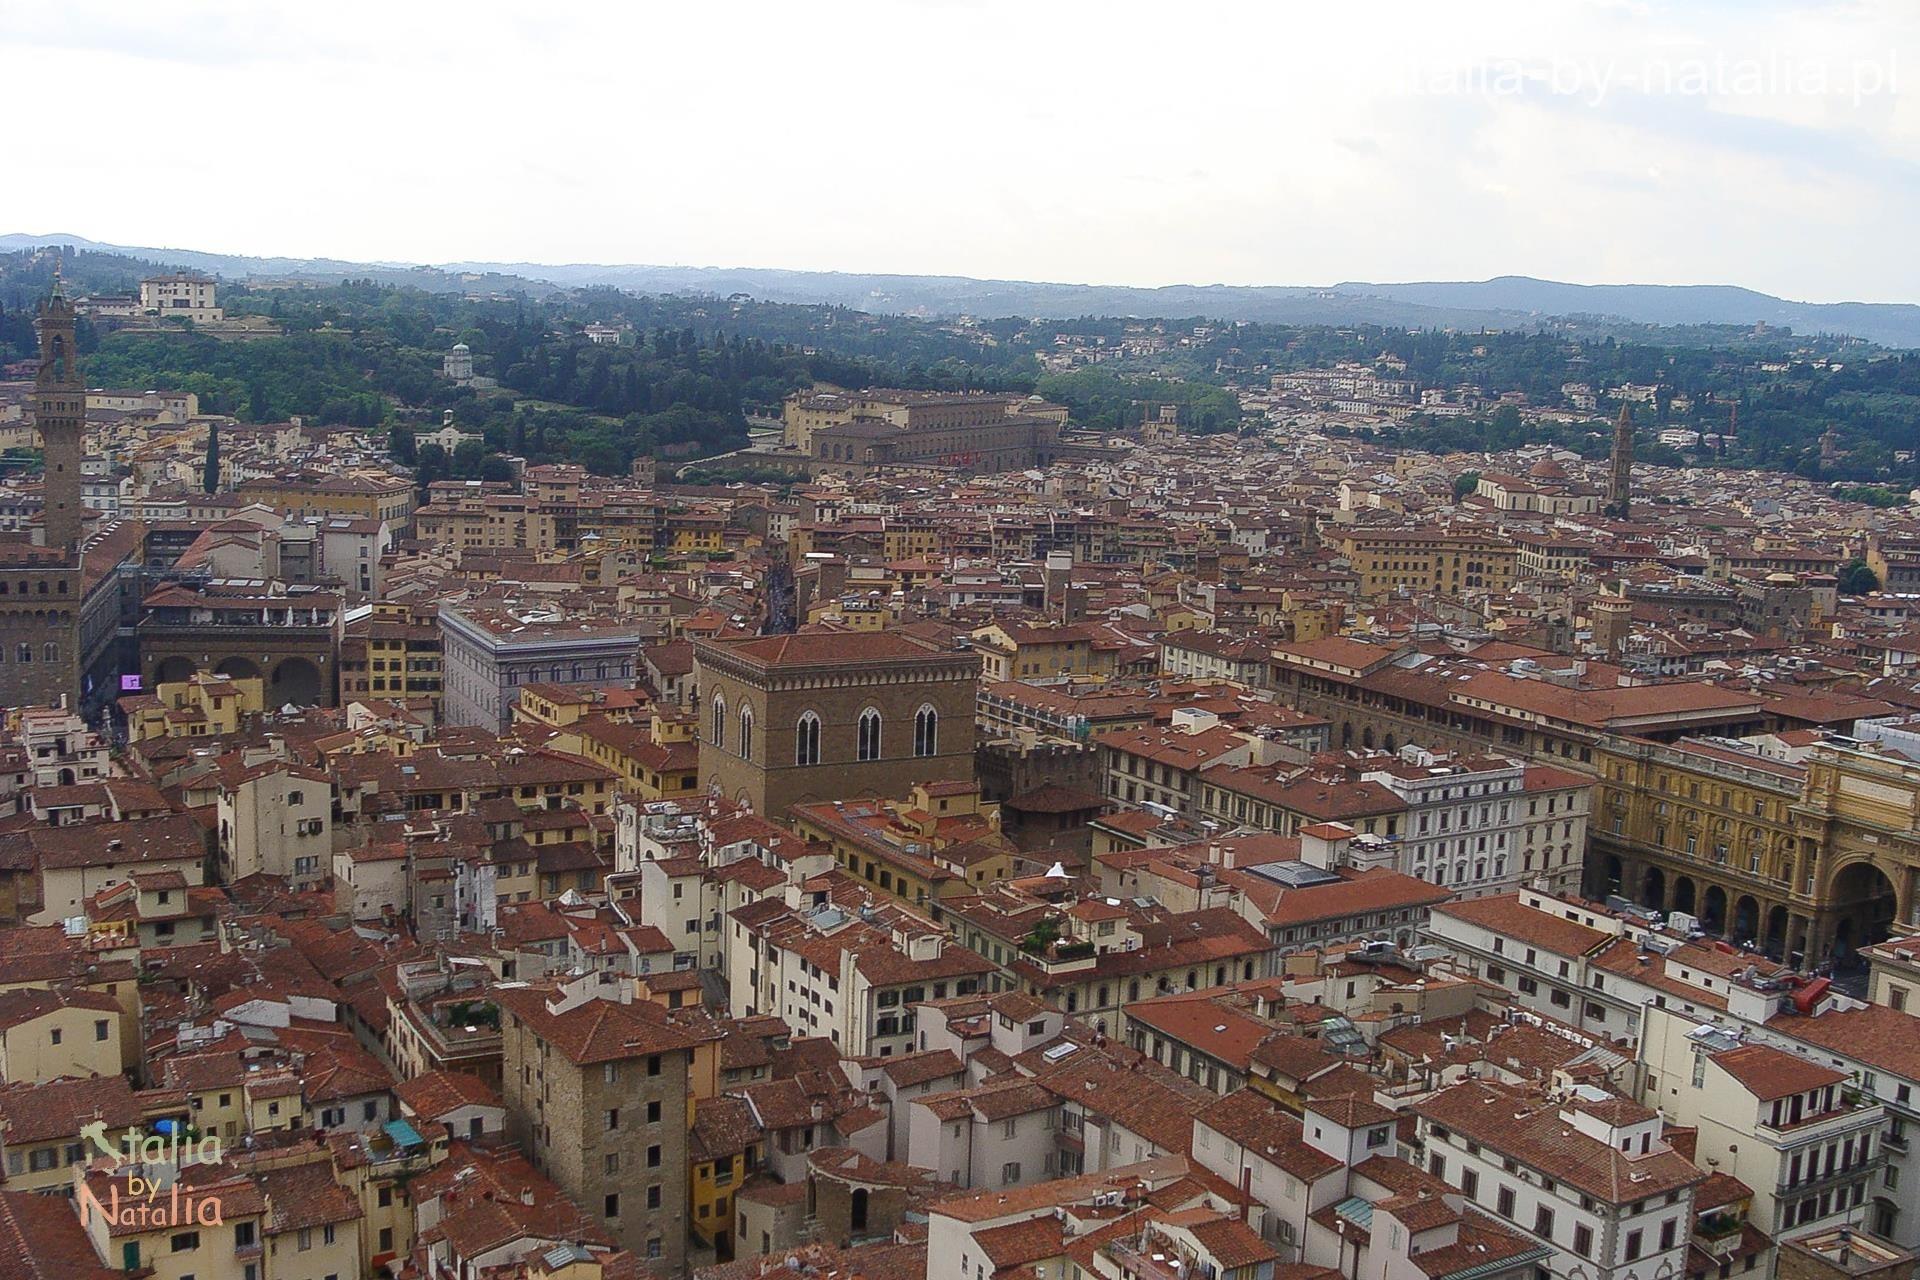 Florencja Katedra widok punkt widokowy panorama kopuła